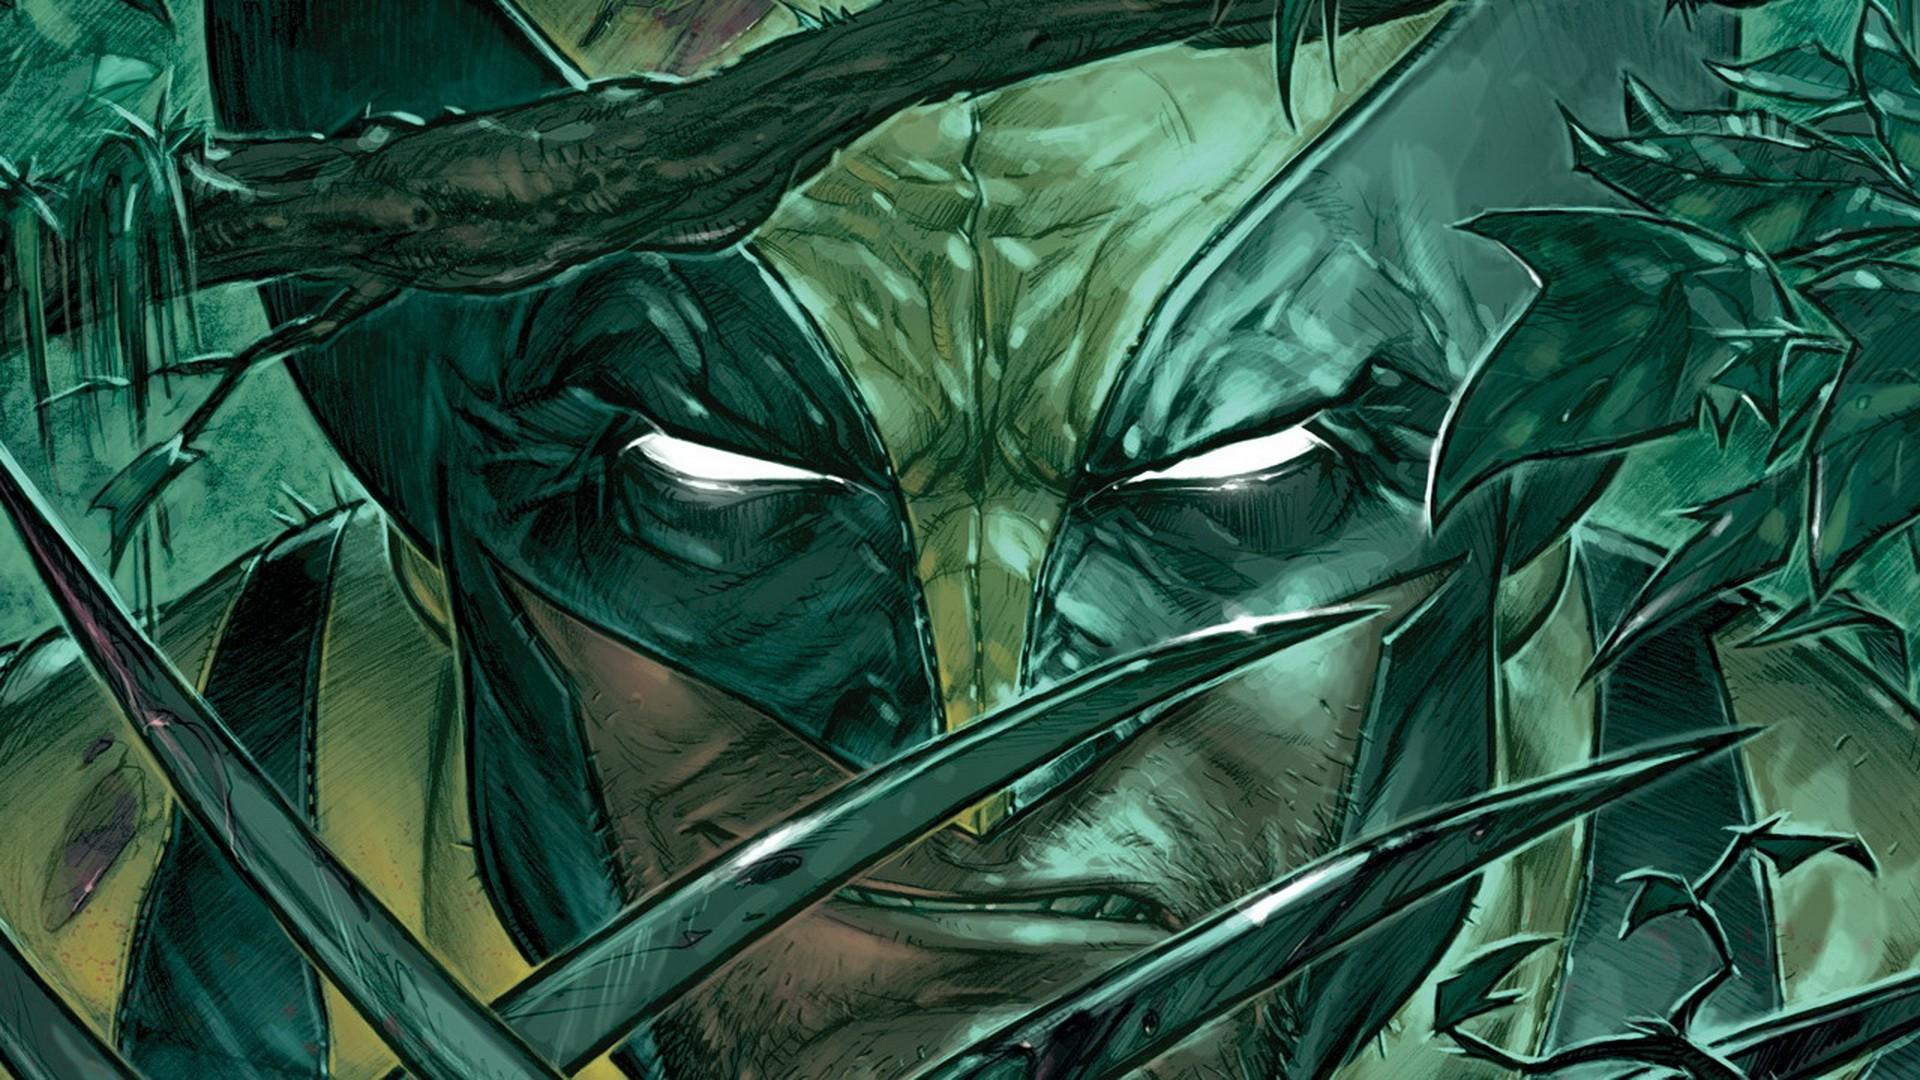 Popular Wallpaper Marvel Face - drawing-illustration-artwork-Wolverine-symmetry-green-Marvel-Comics-X-Men-sketch-screenshot-fictional-character-259044  Gallery_879468.jpg